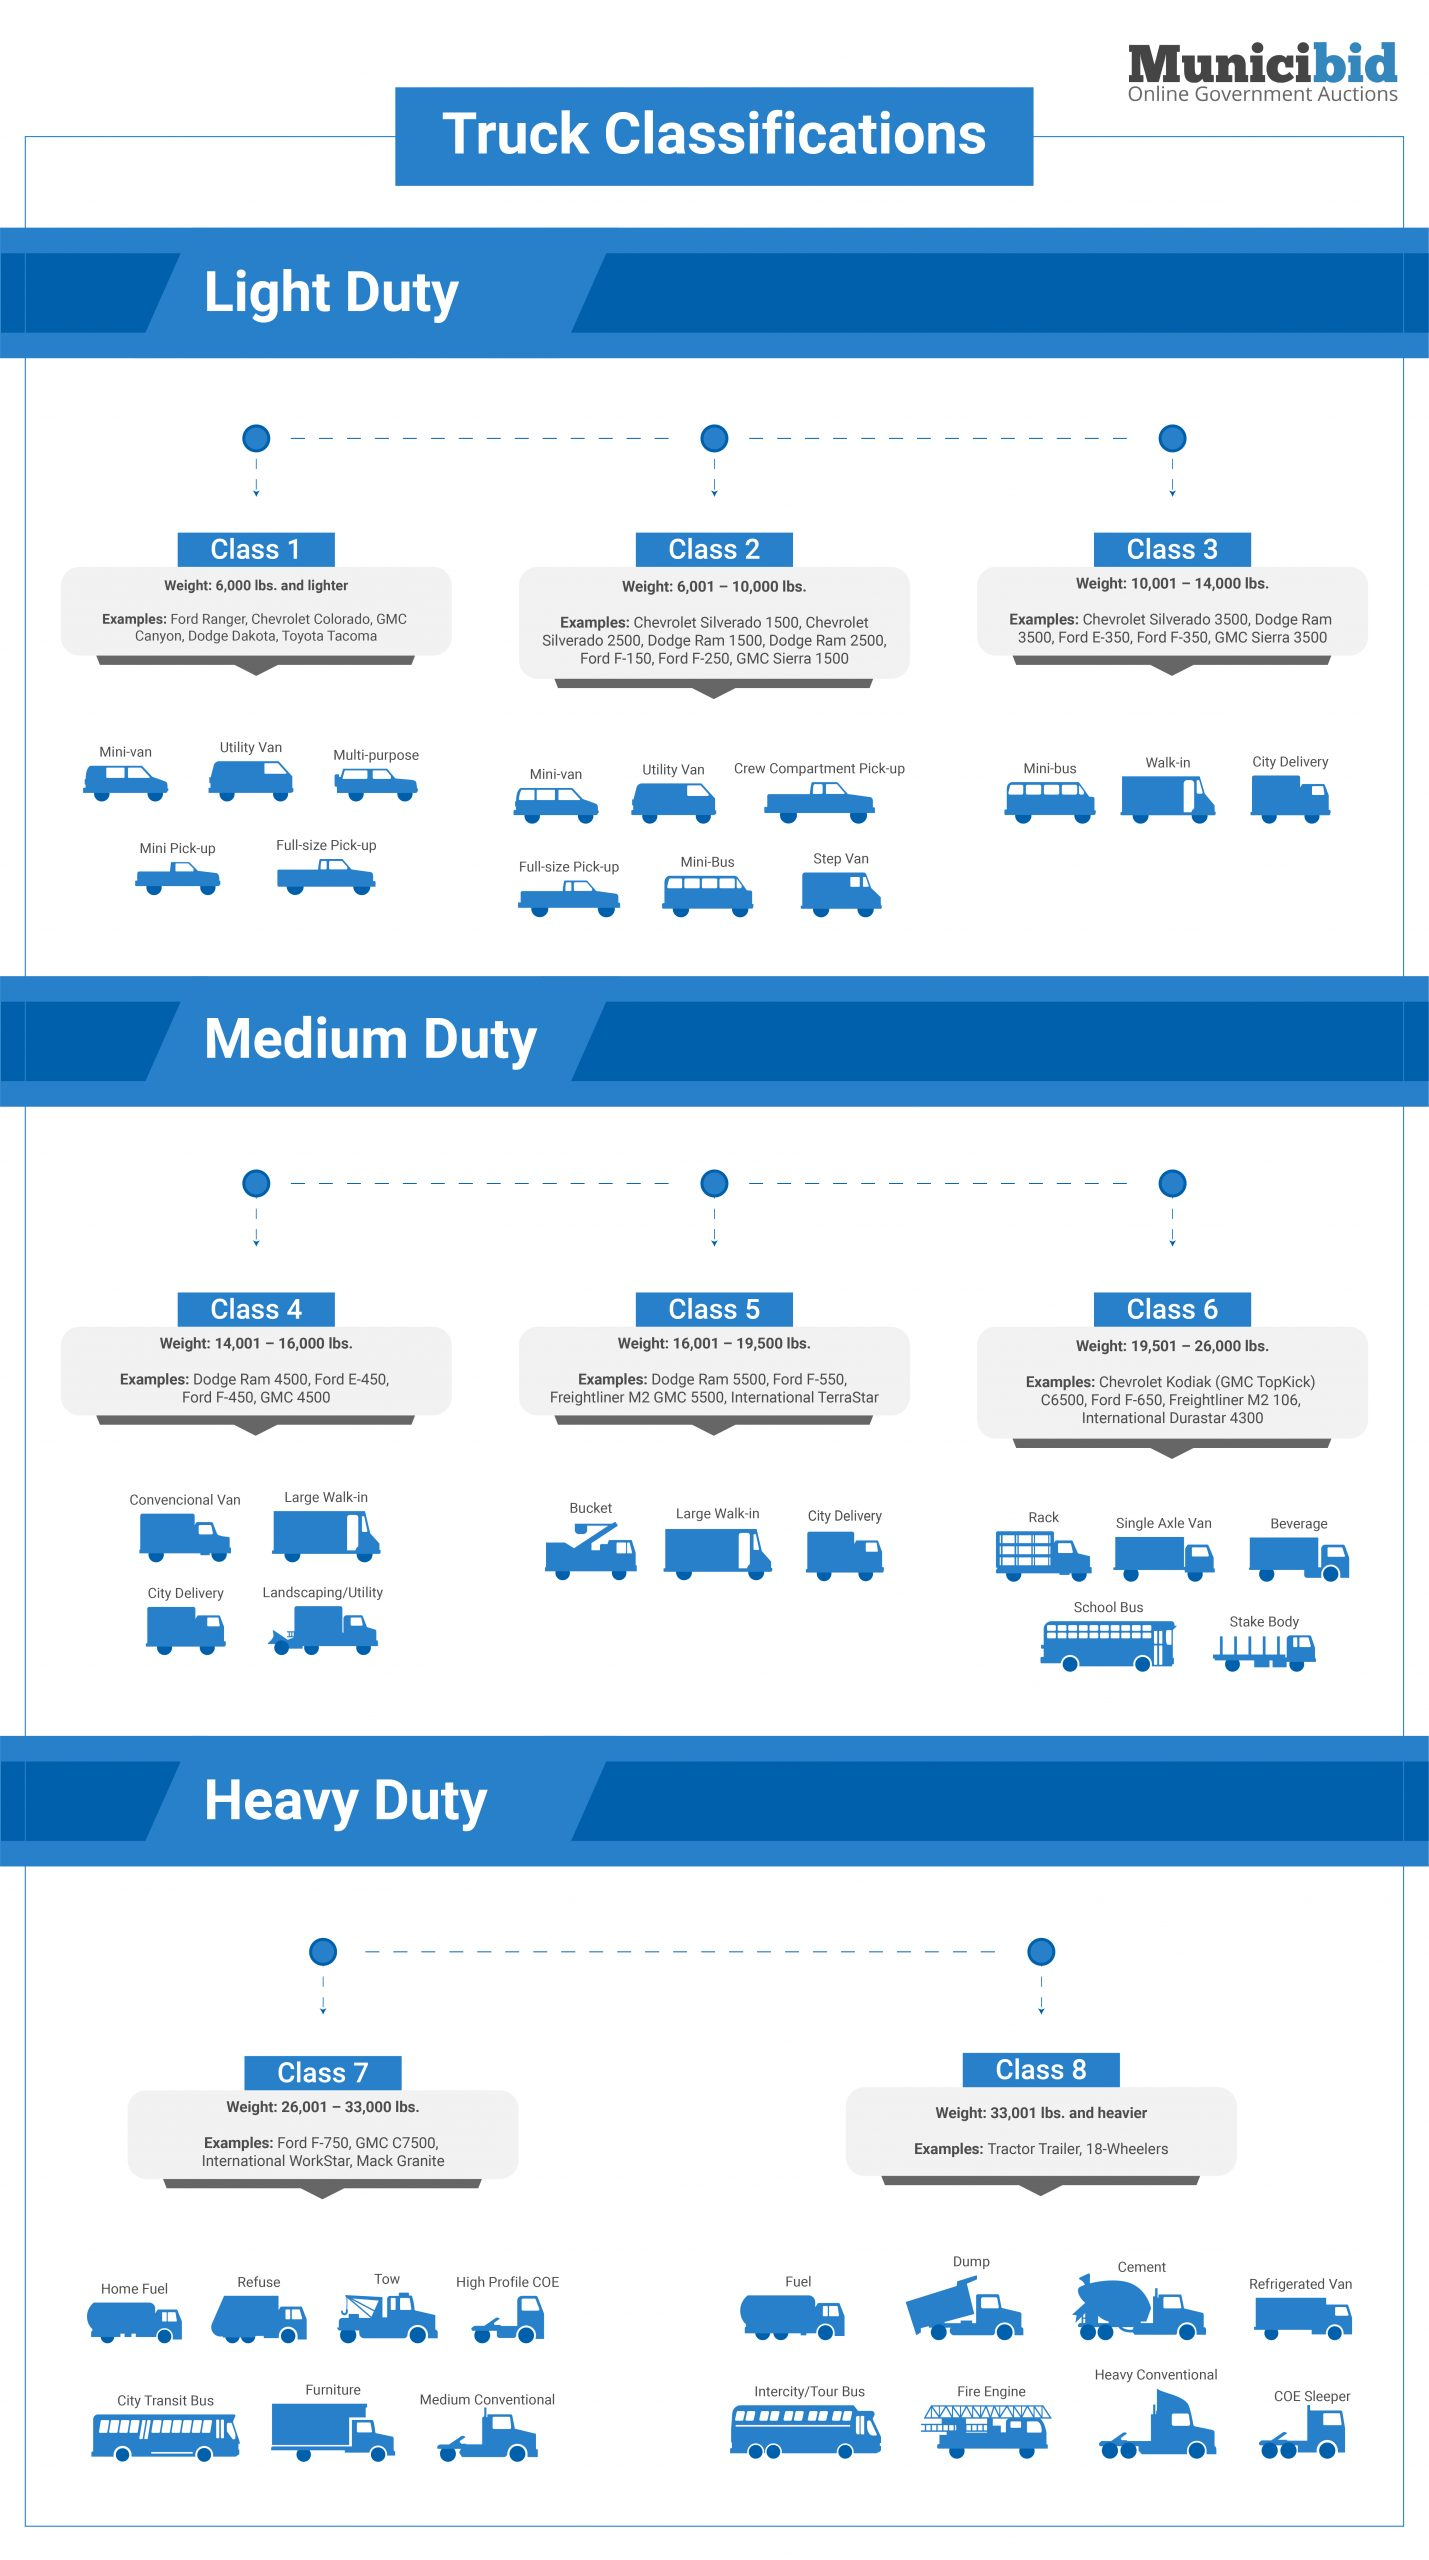 Light, Medium, and Heavy Duty Truck Classifications